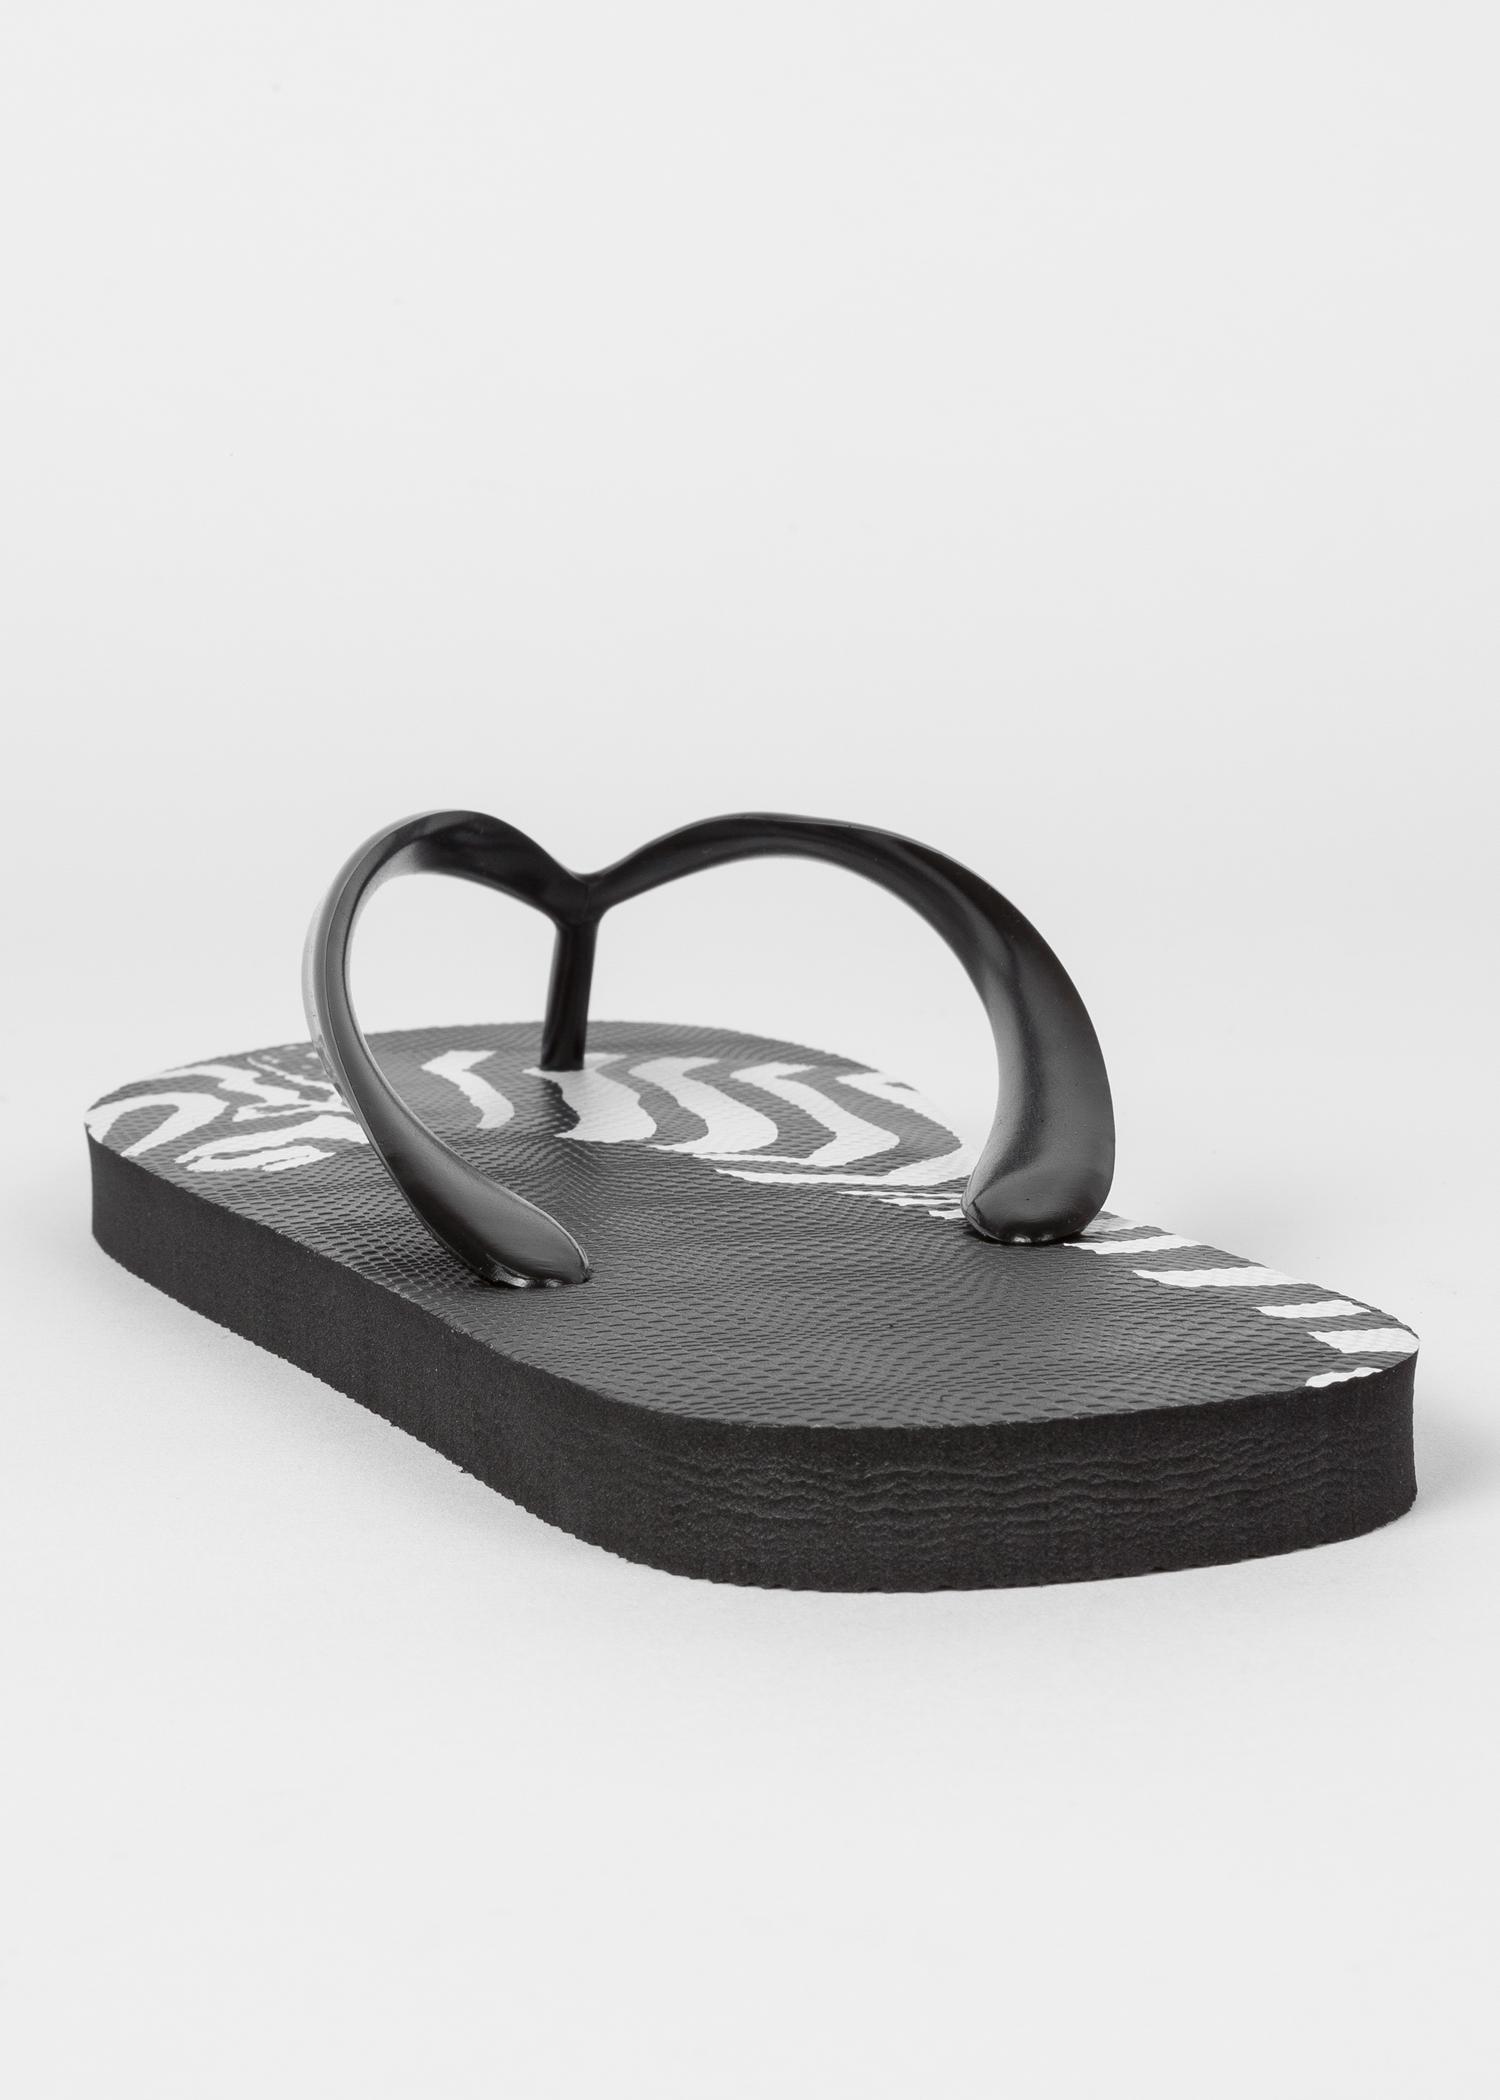 69a3a6232bfc ... Flops Paul Smith · Heel detail - Men s Black  Zebra  Print  Disc  Flip  ...